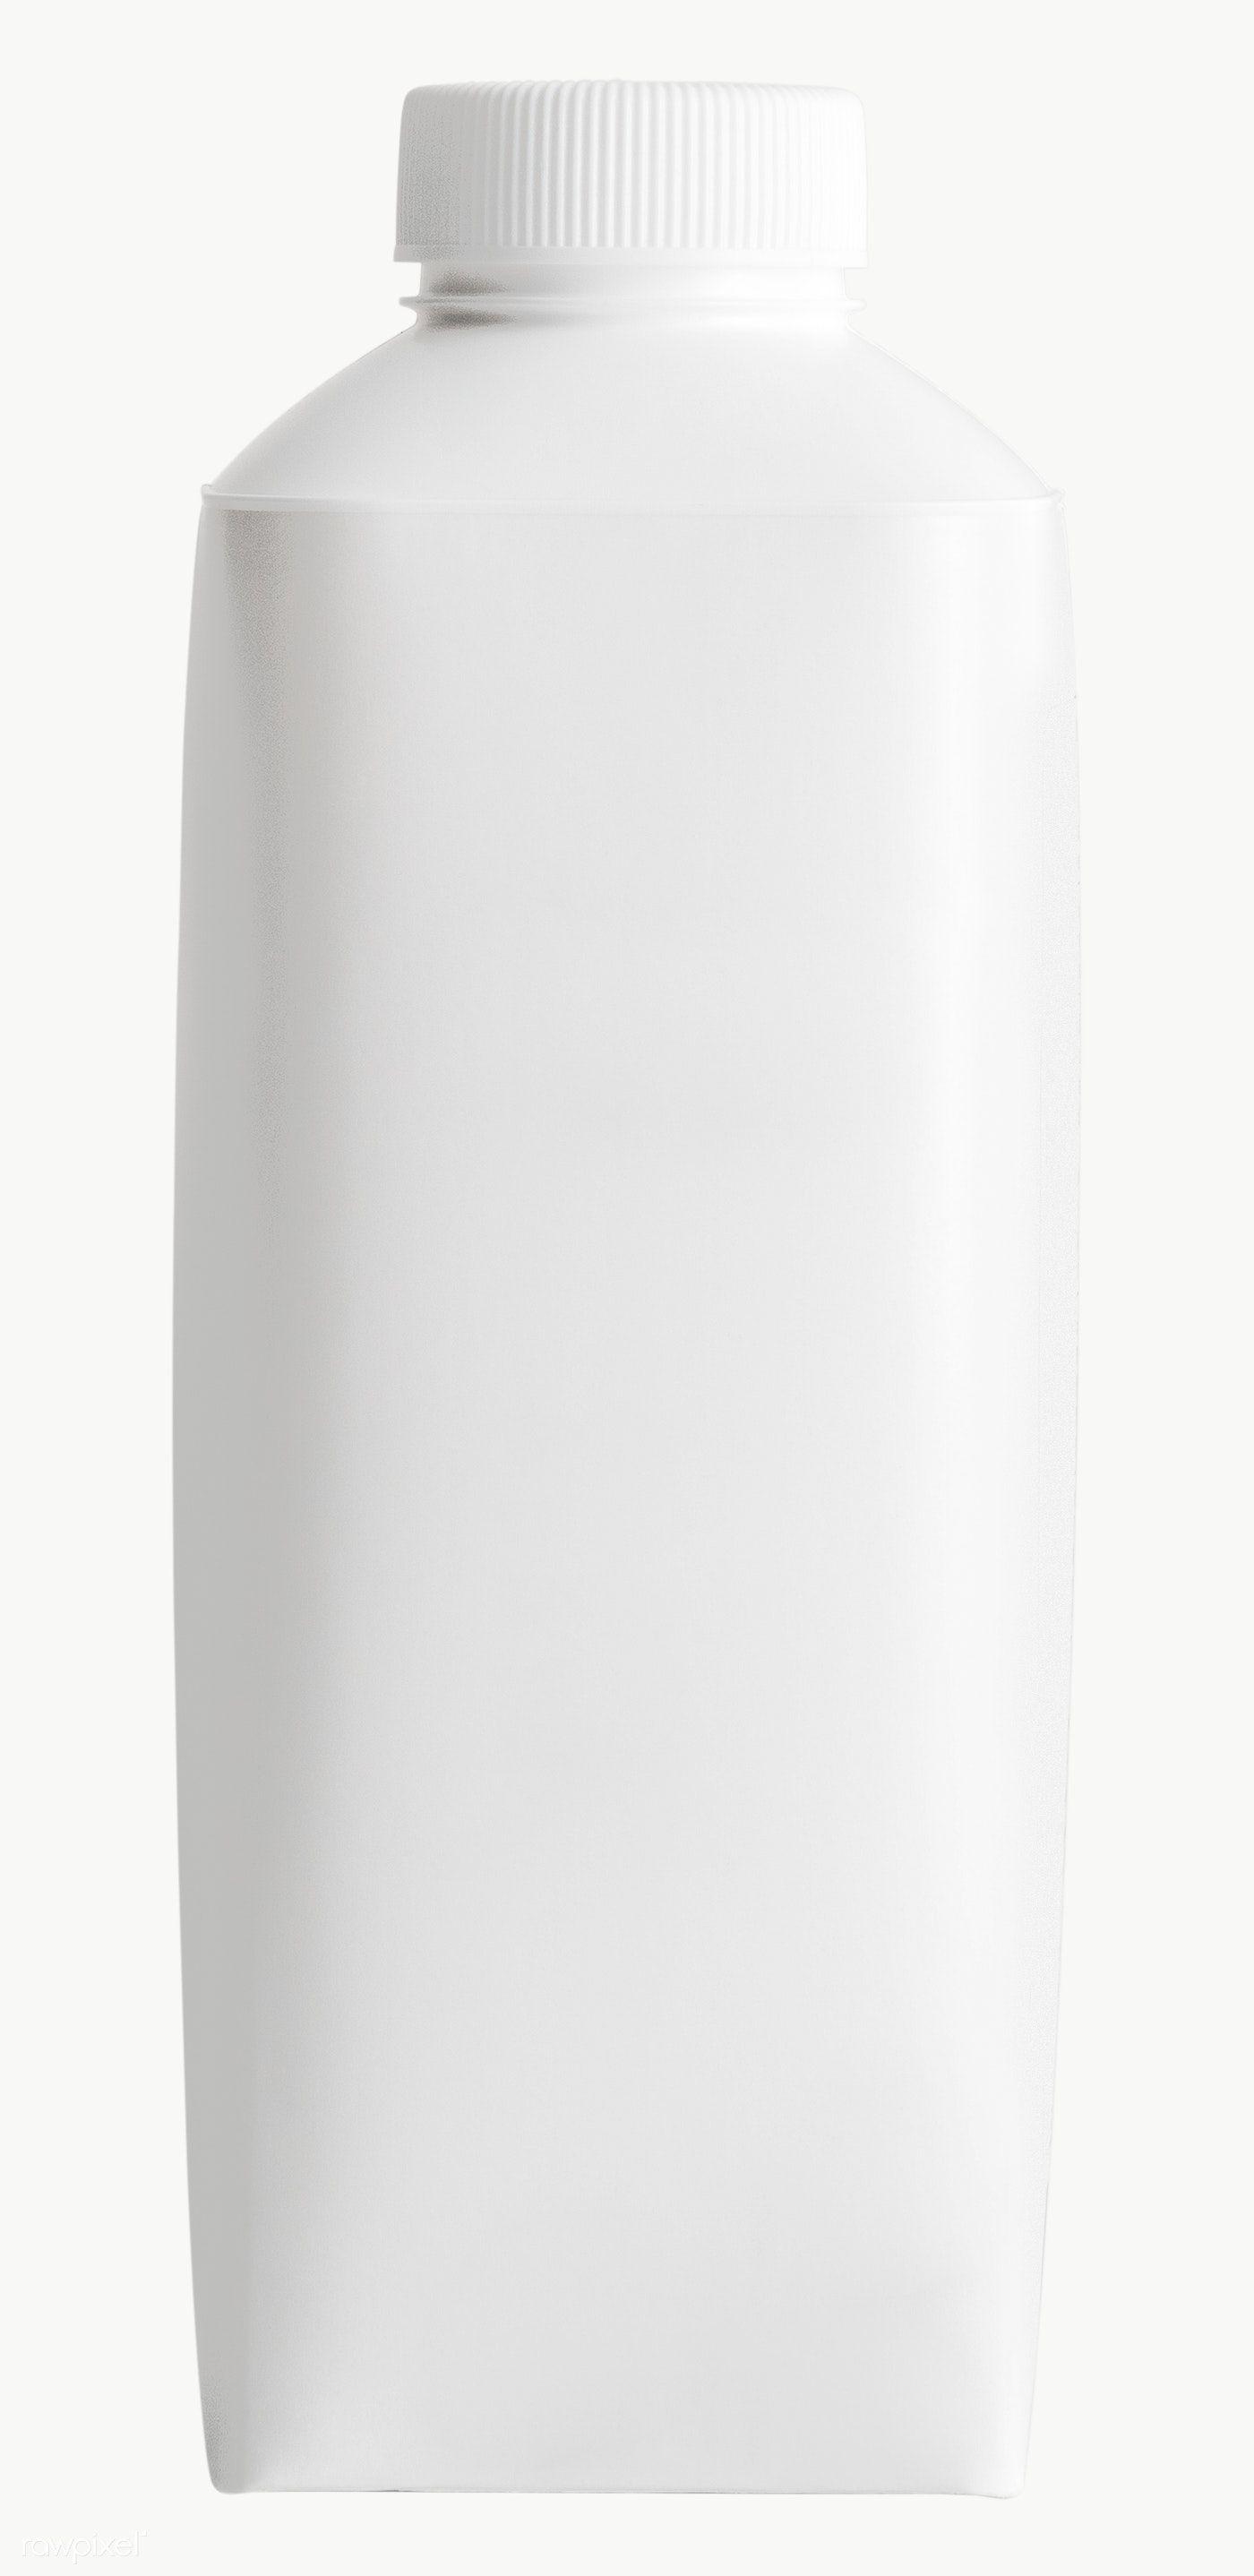 Minimal White Milk Carton Design Element Free Image By Rawpixel Com Teddy Rawpixel Carton Design Milk Carton Design Element